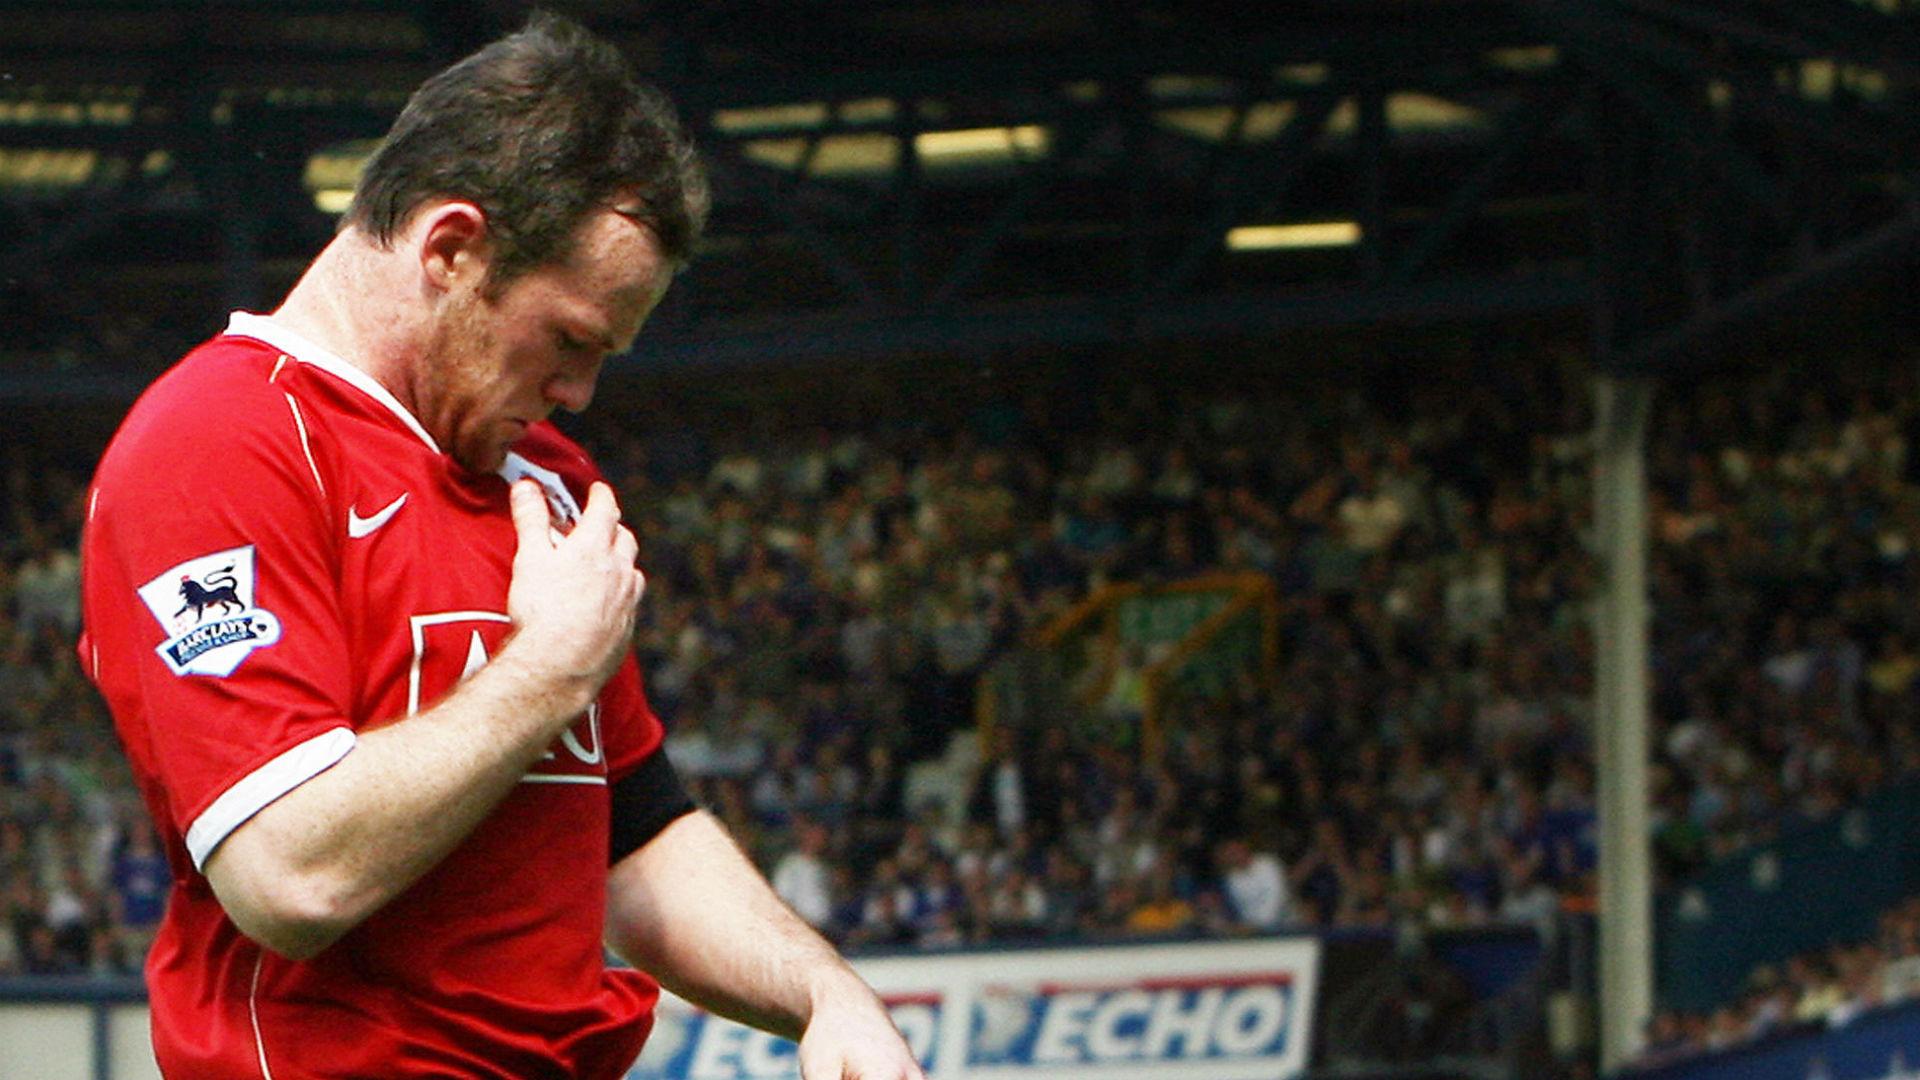 Wayne Rooney Manchester United vs Everton 2007